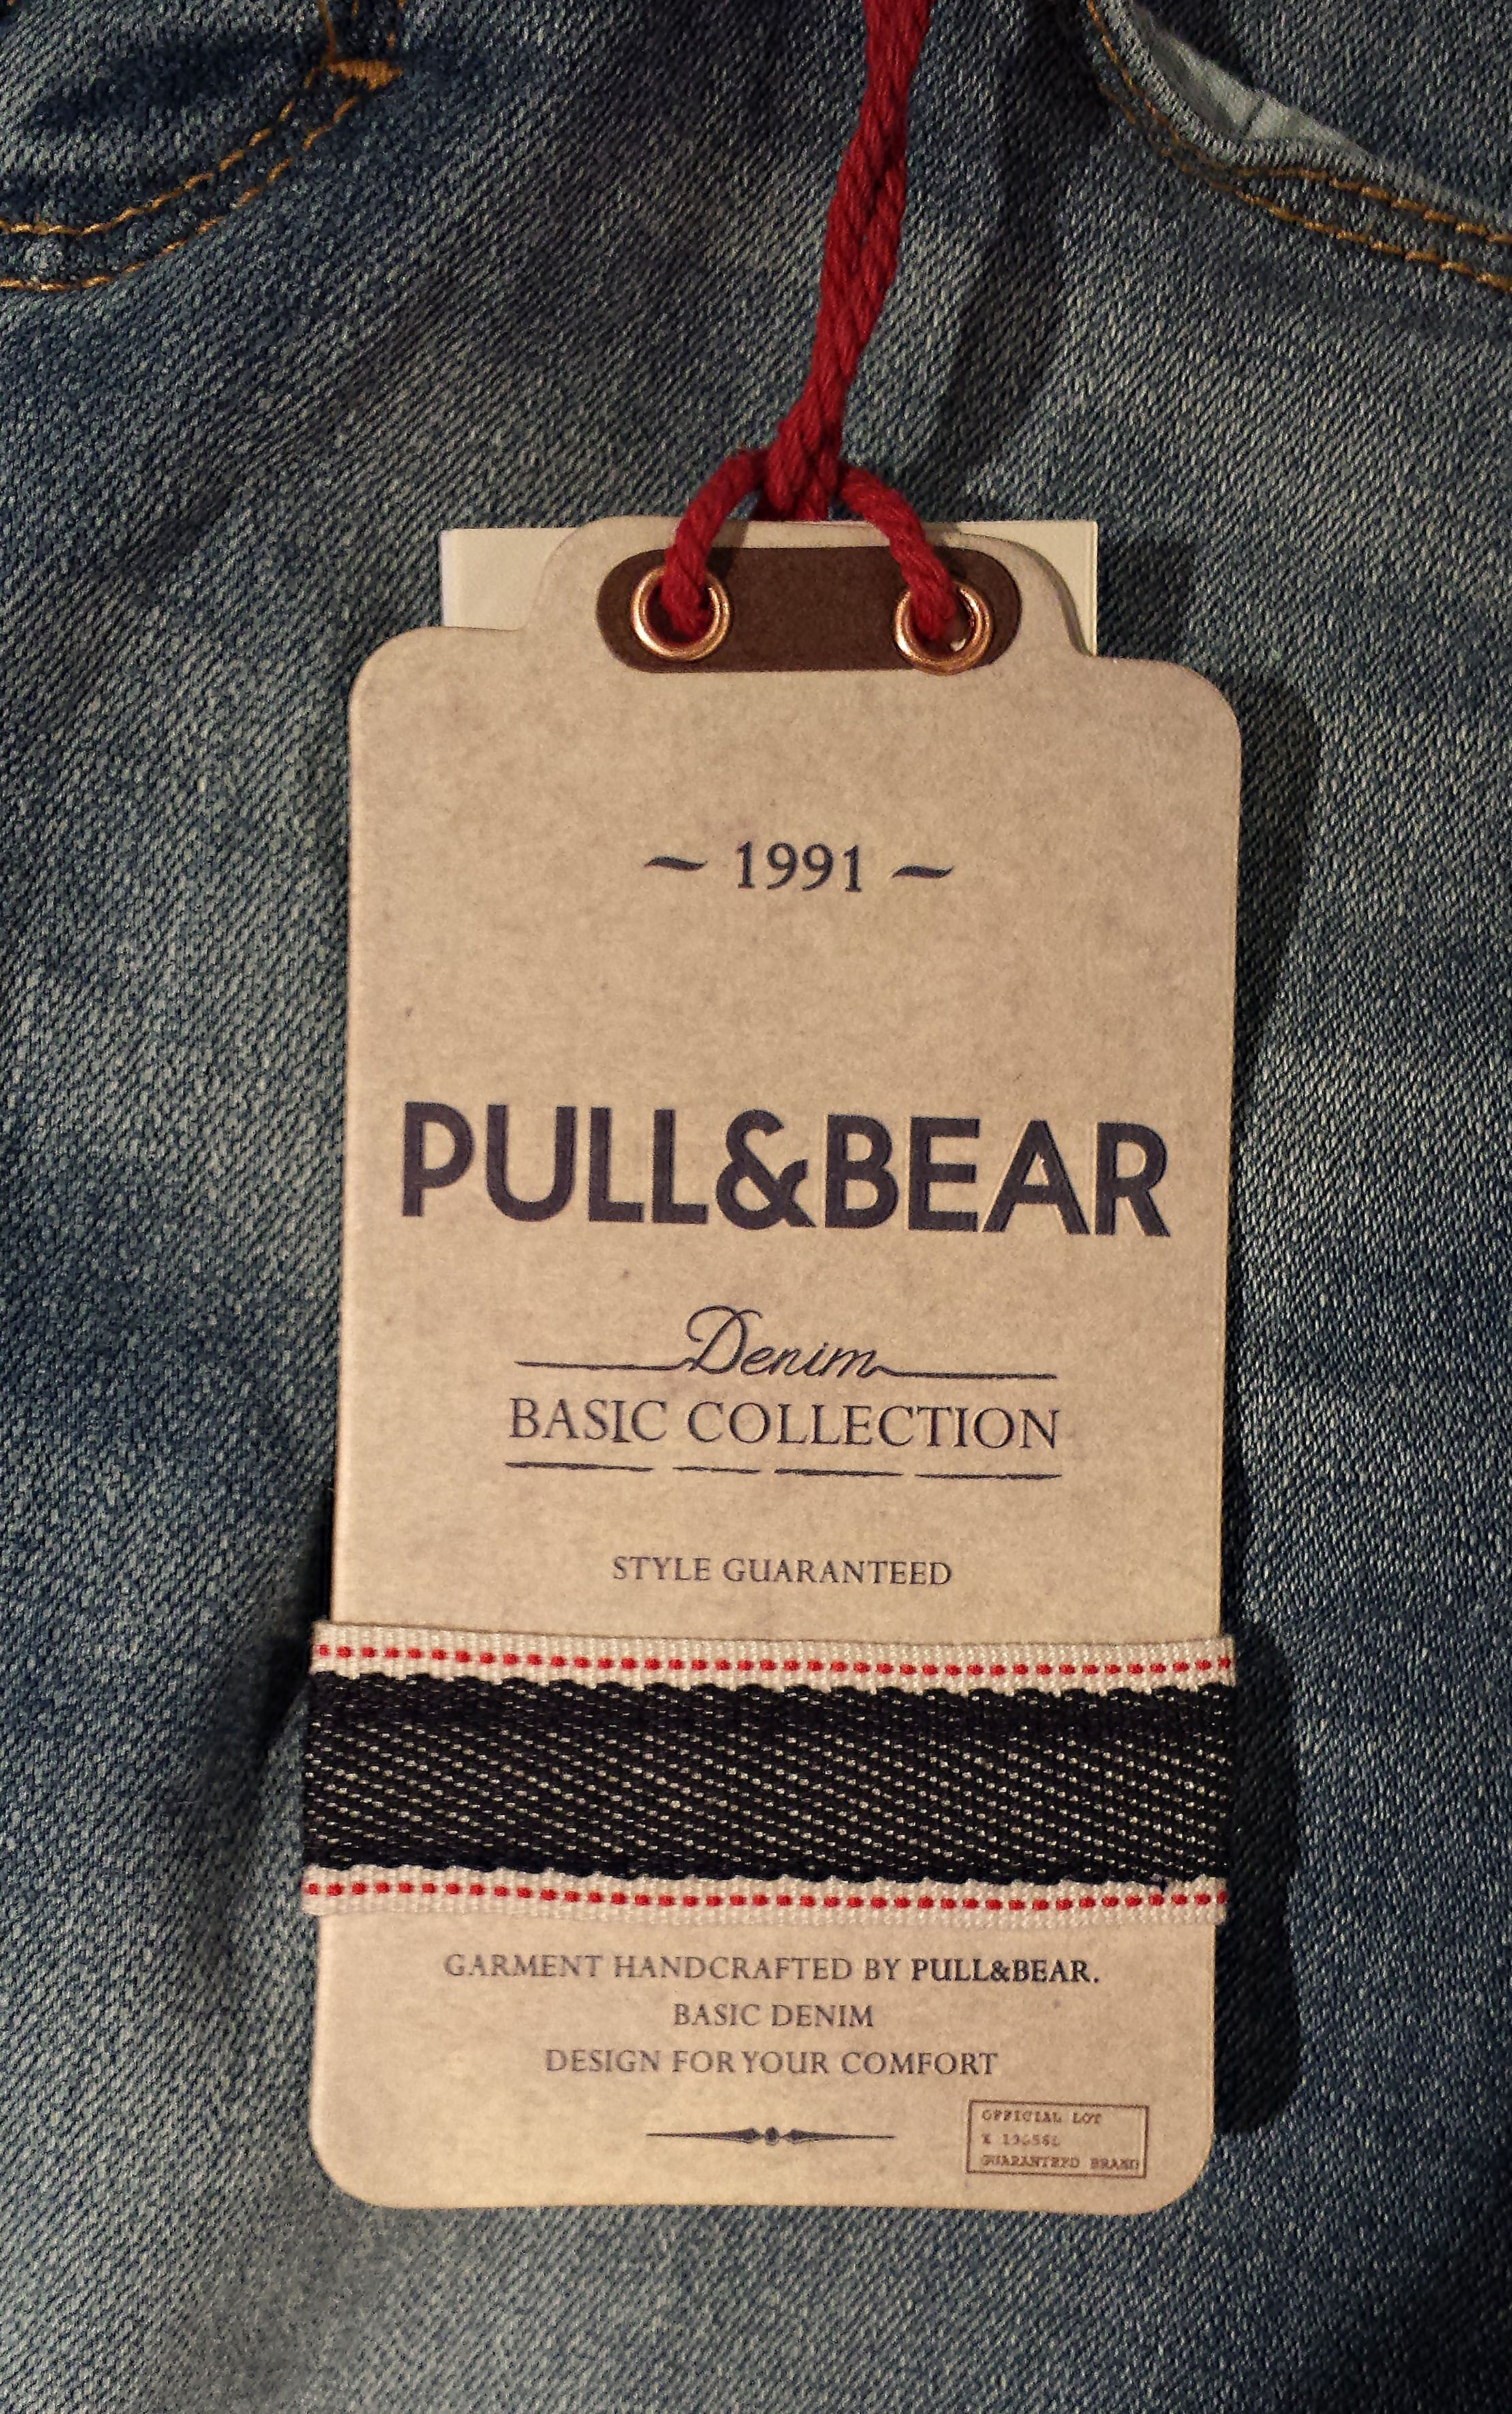 Pull & Bear #hangtag | Packaging - Paperie | Pinterest ...